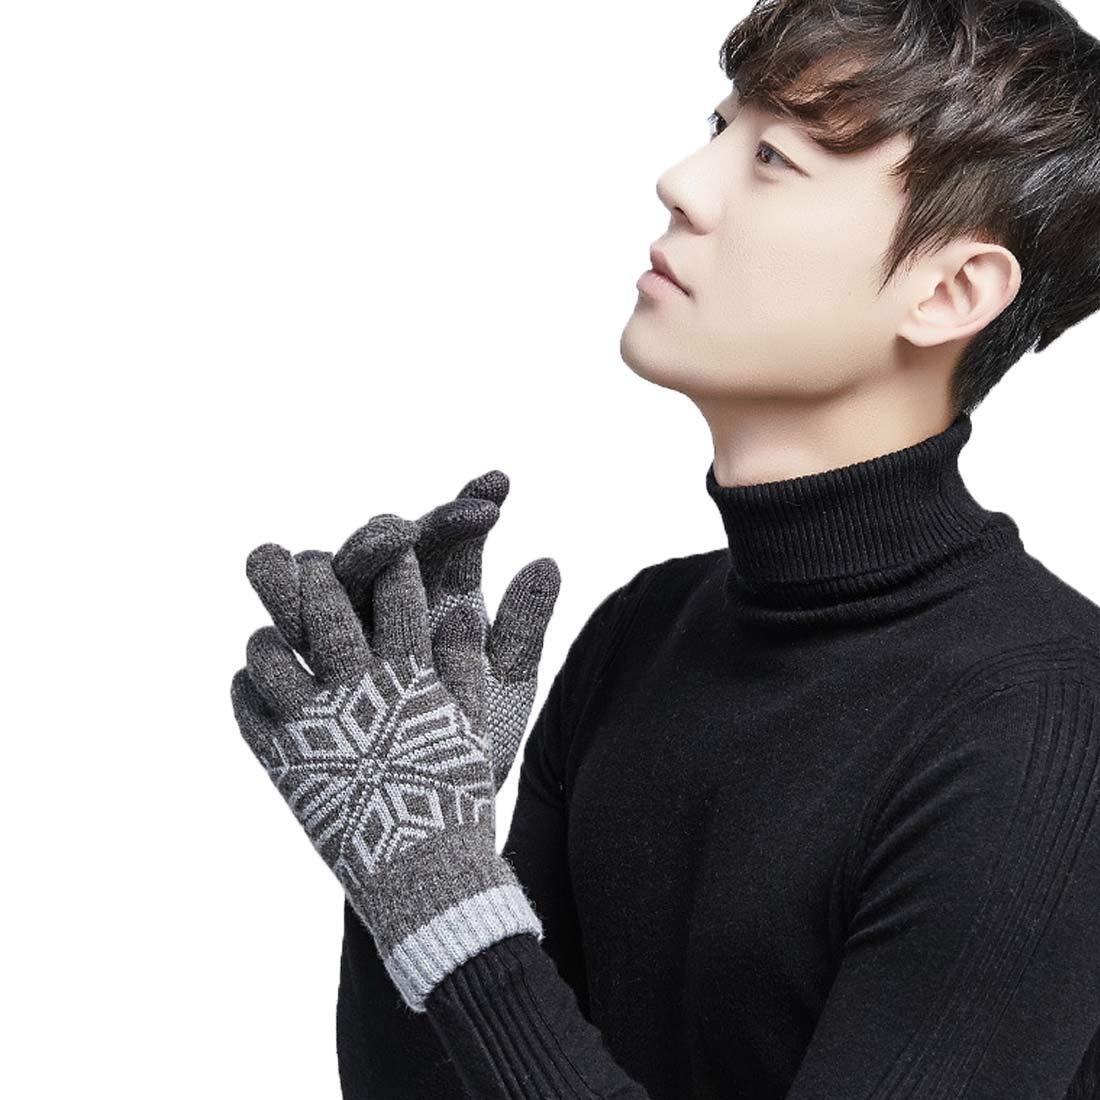 King Star Warm Winter Gloves Knit Fleeced Windproof Gloves Cycling Gloves for Men Women